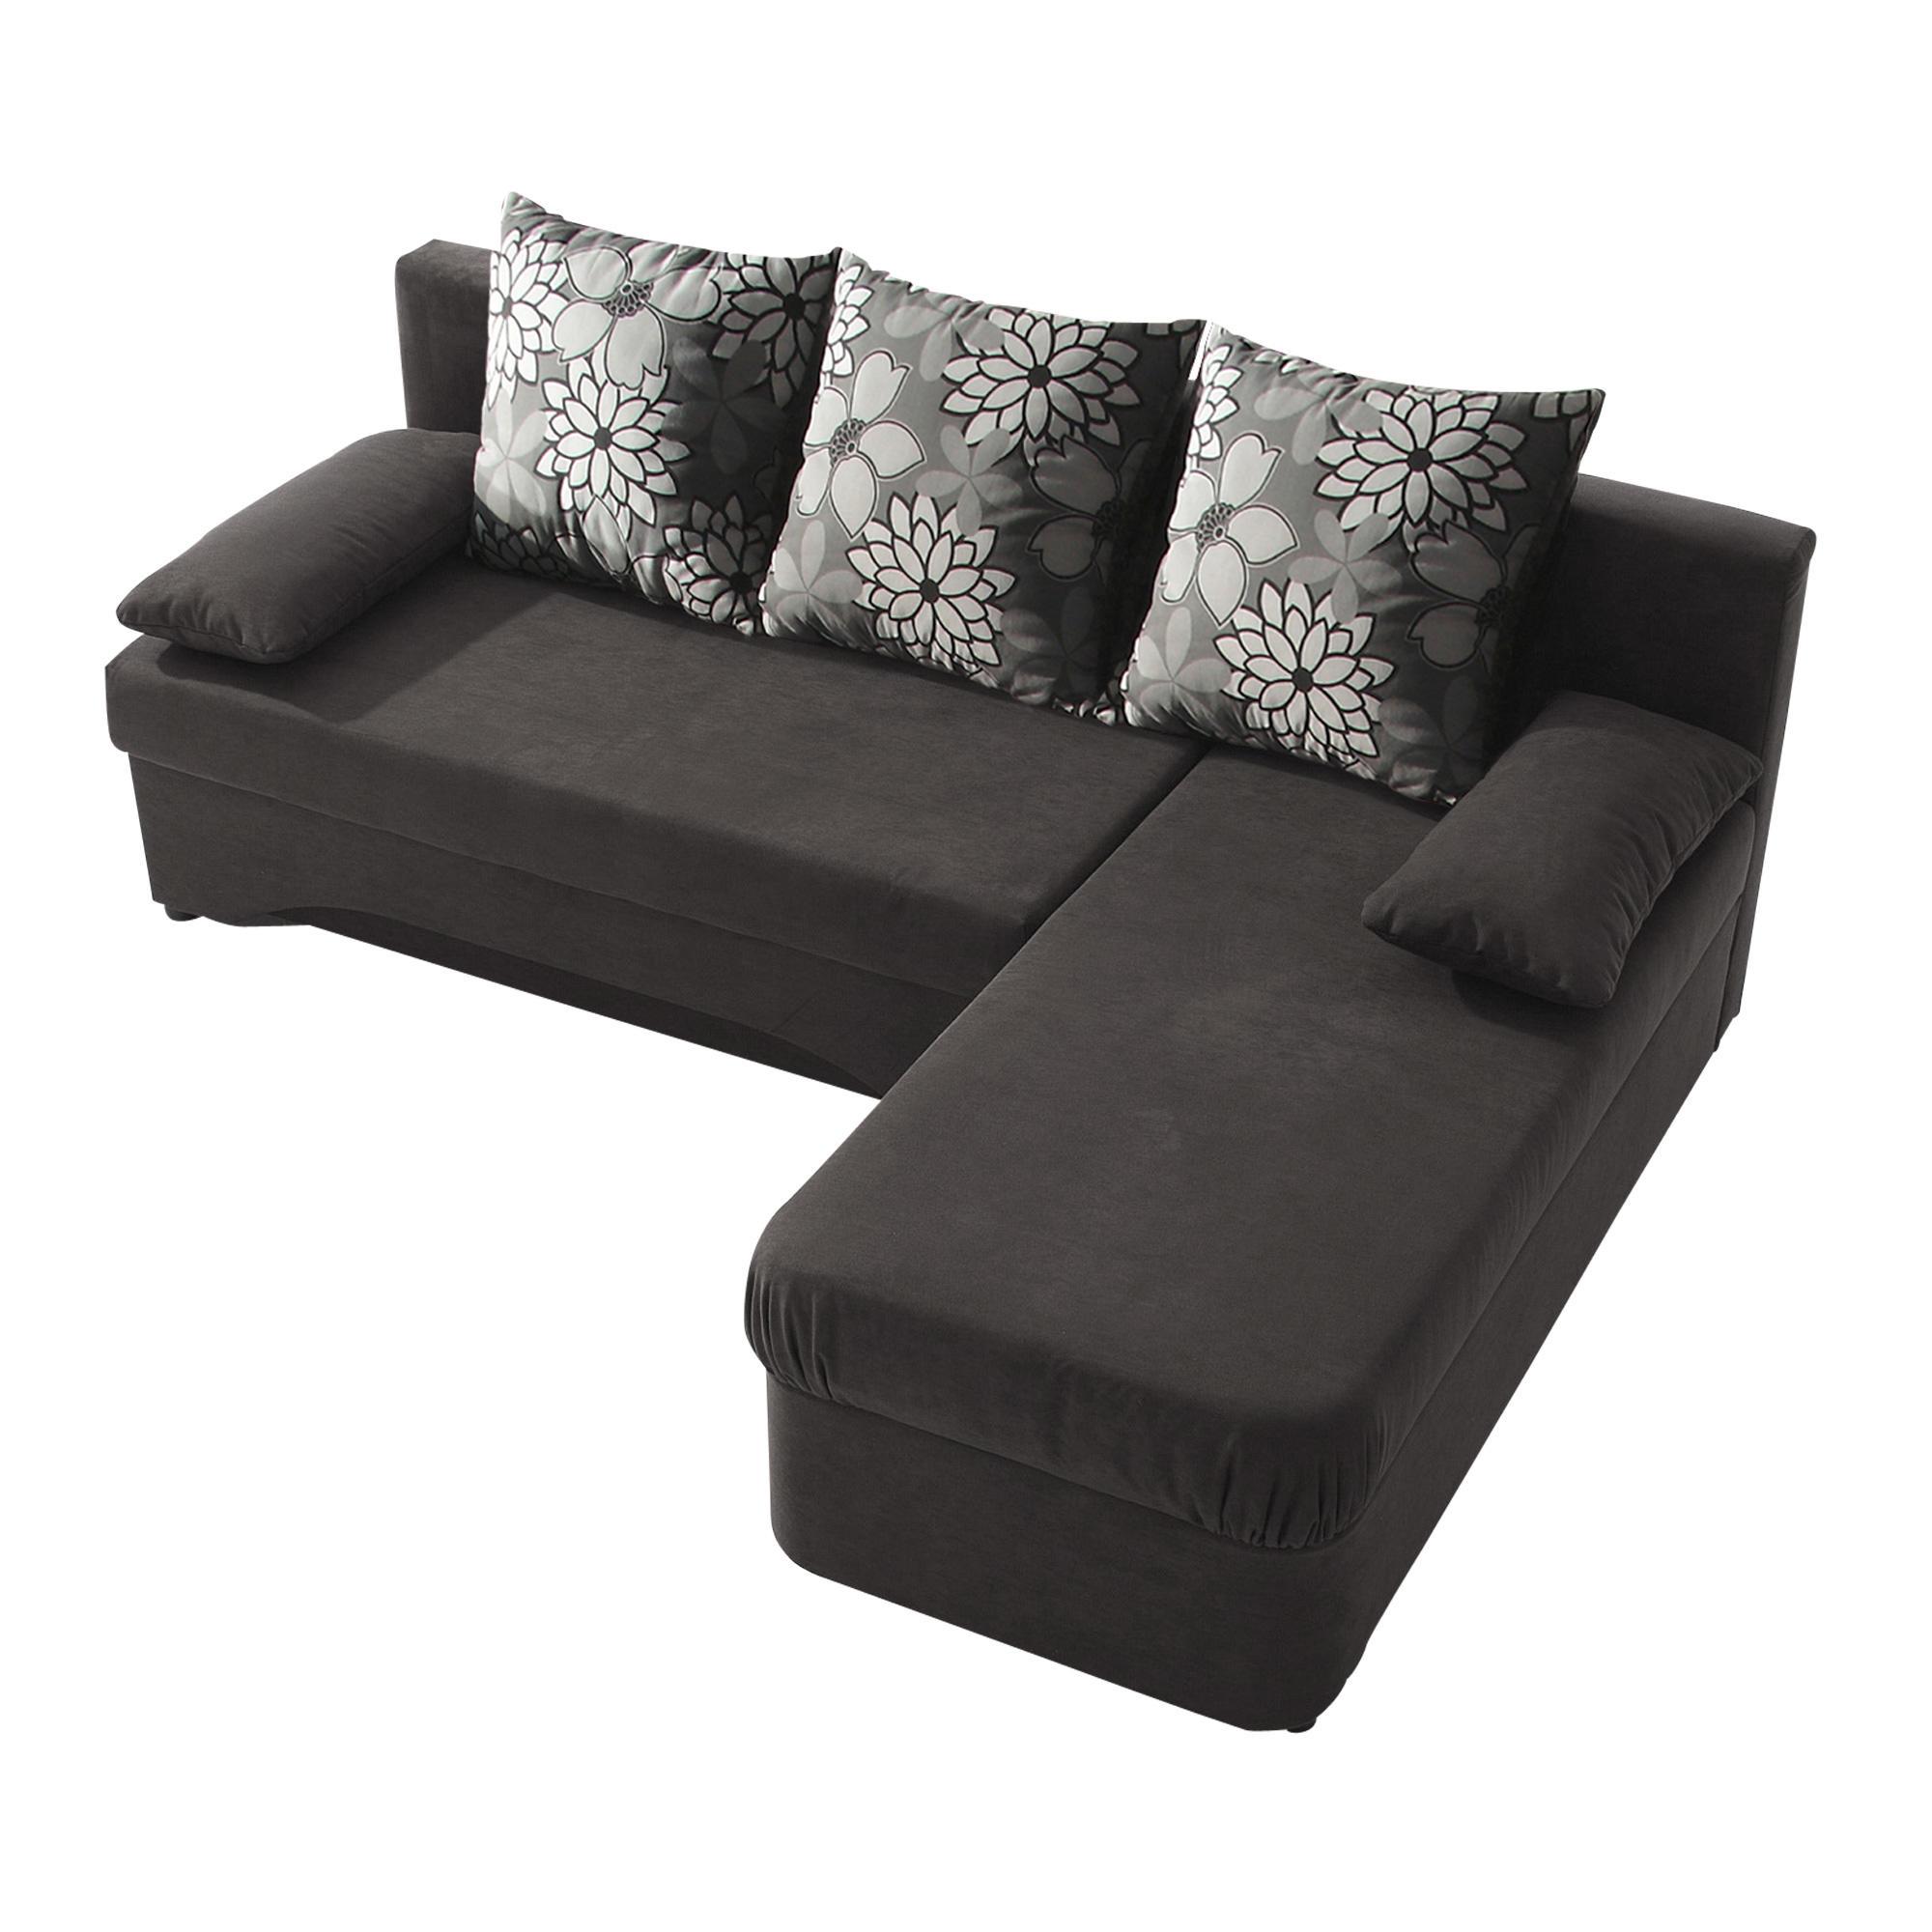 entretenir son canapé avec Unigro